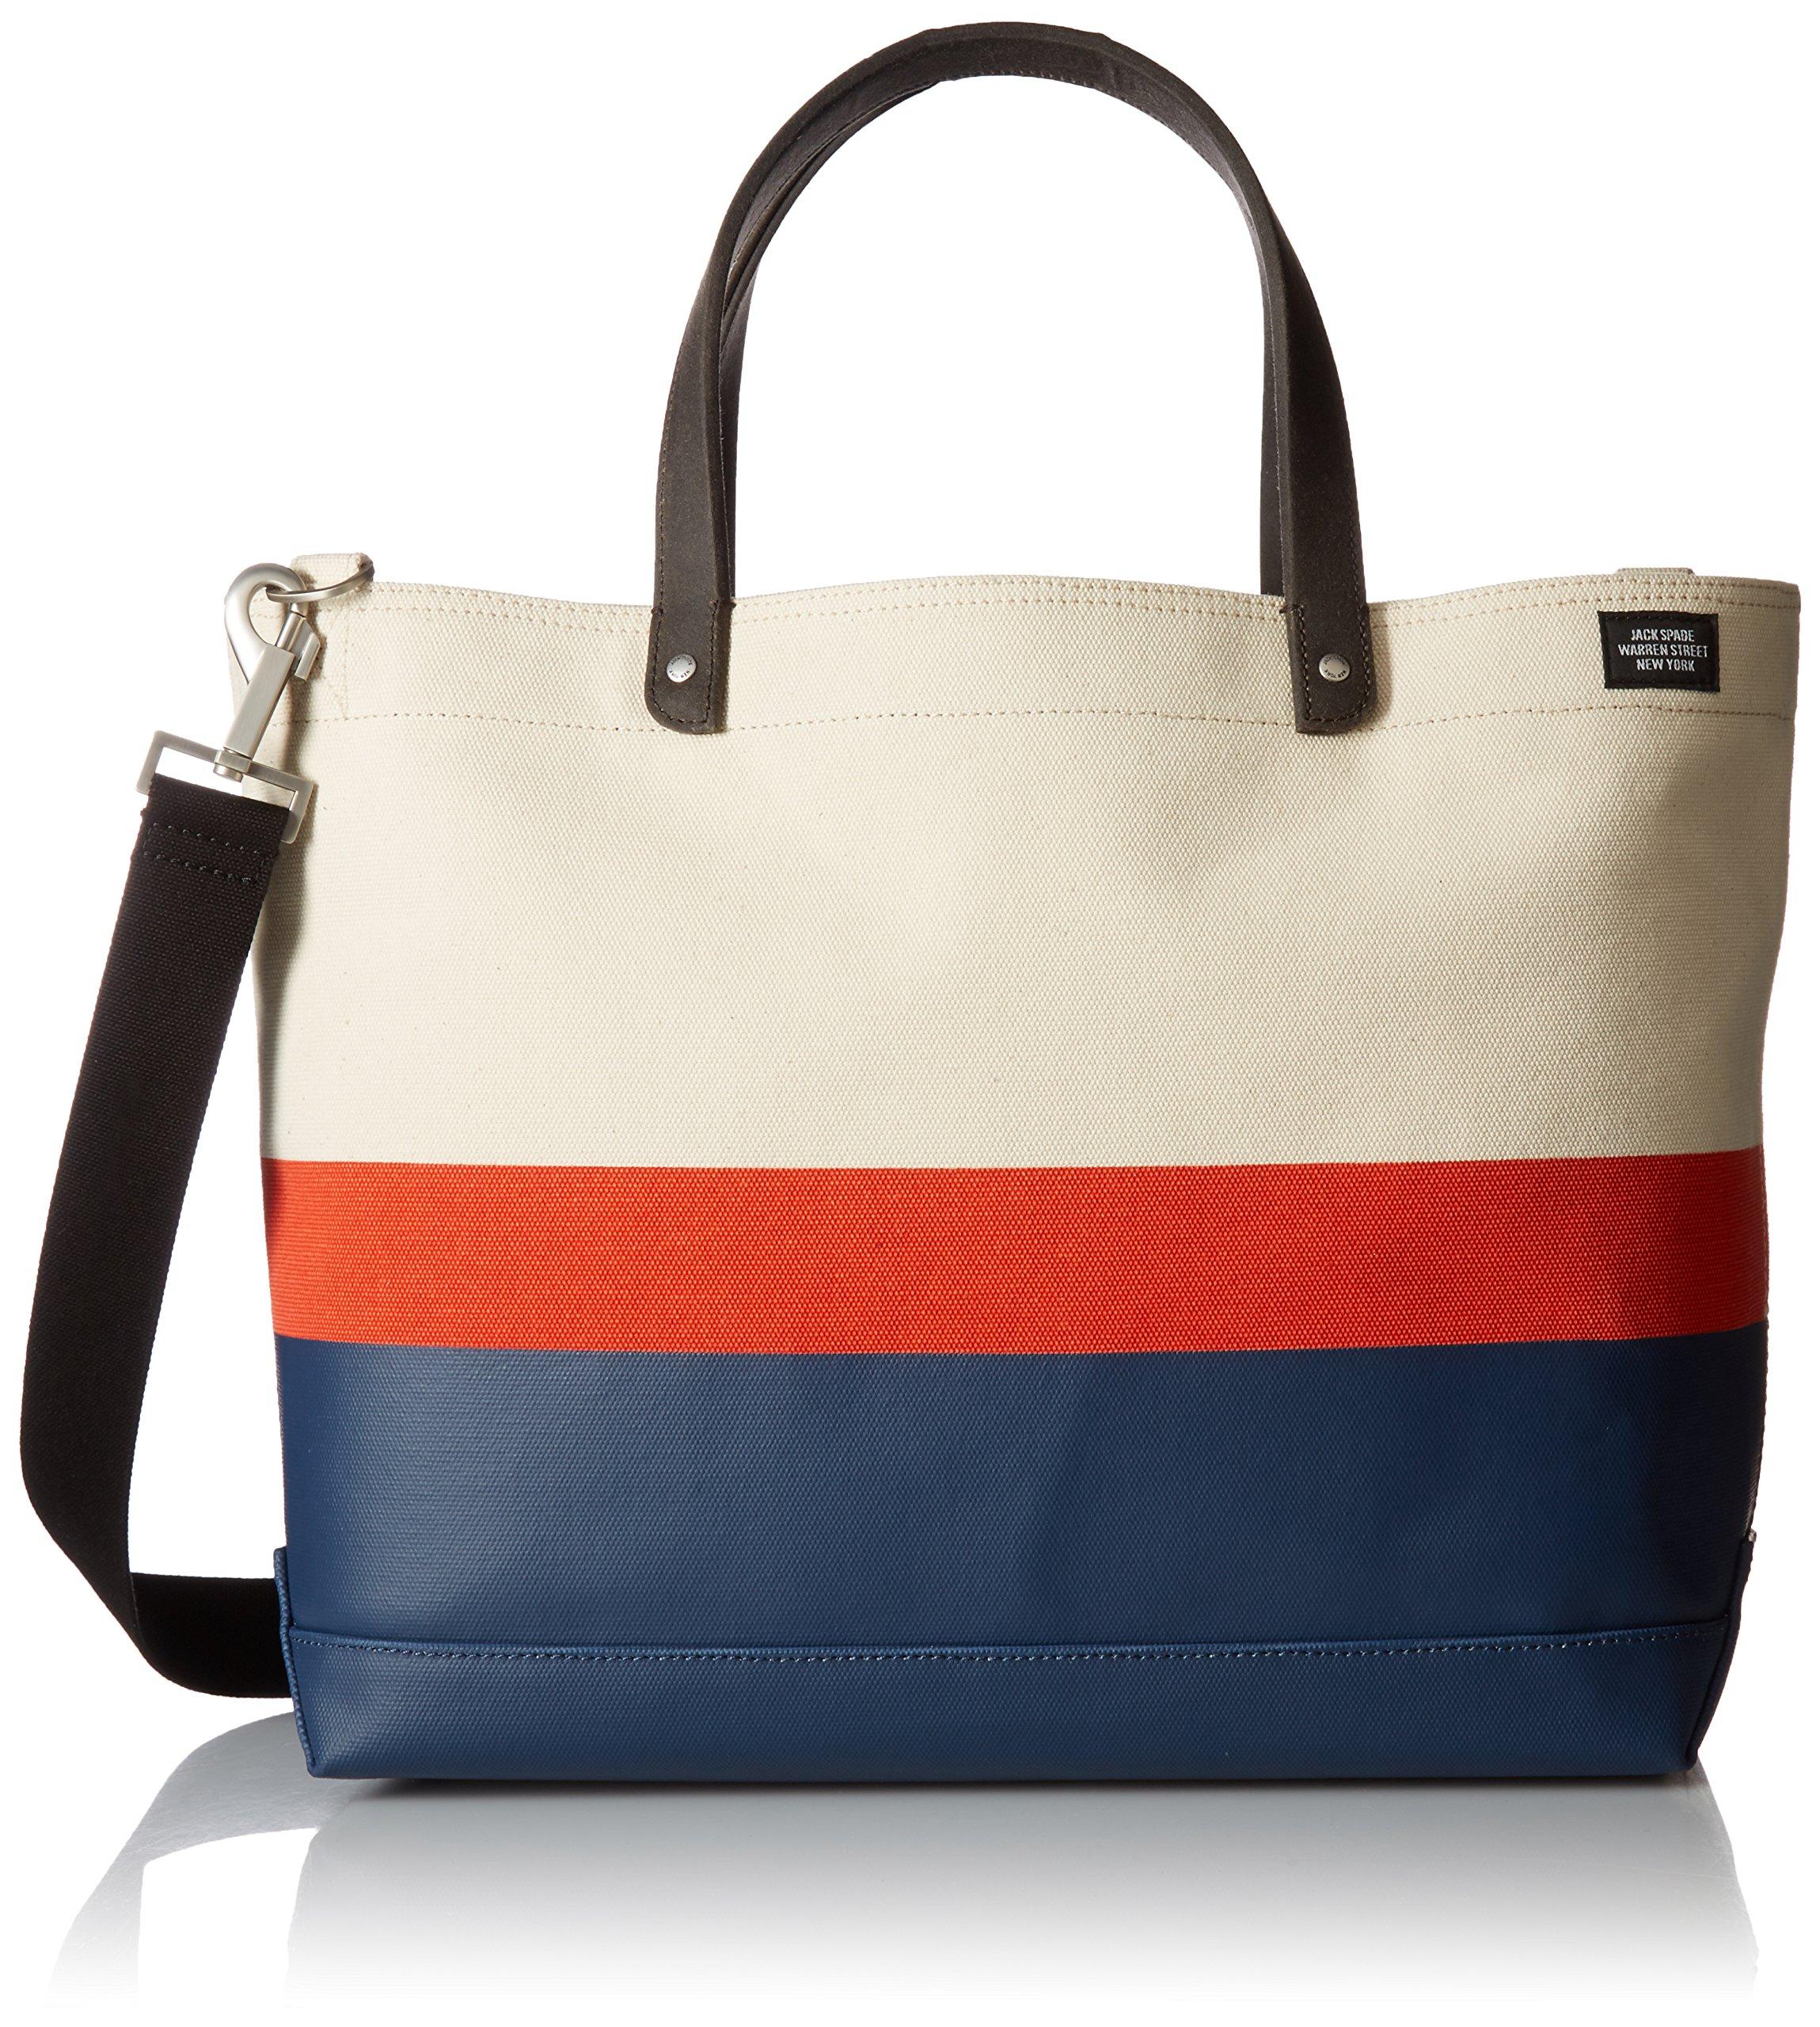 Jack Spade Men's Horizontal Stripe Coal Bag, Natural/Orange/Navy